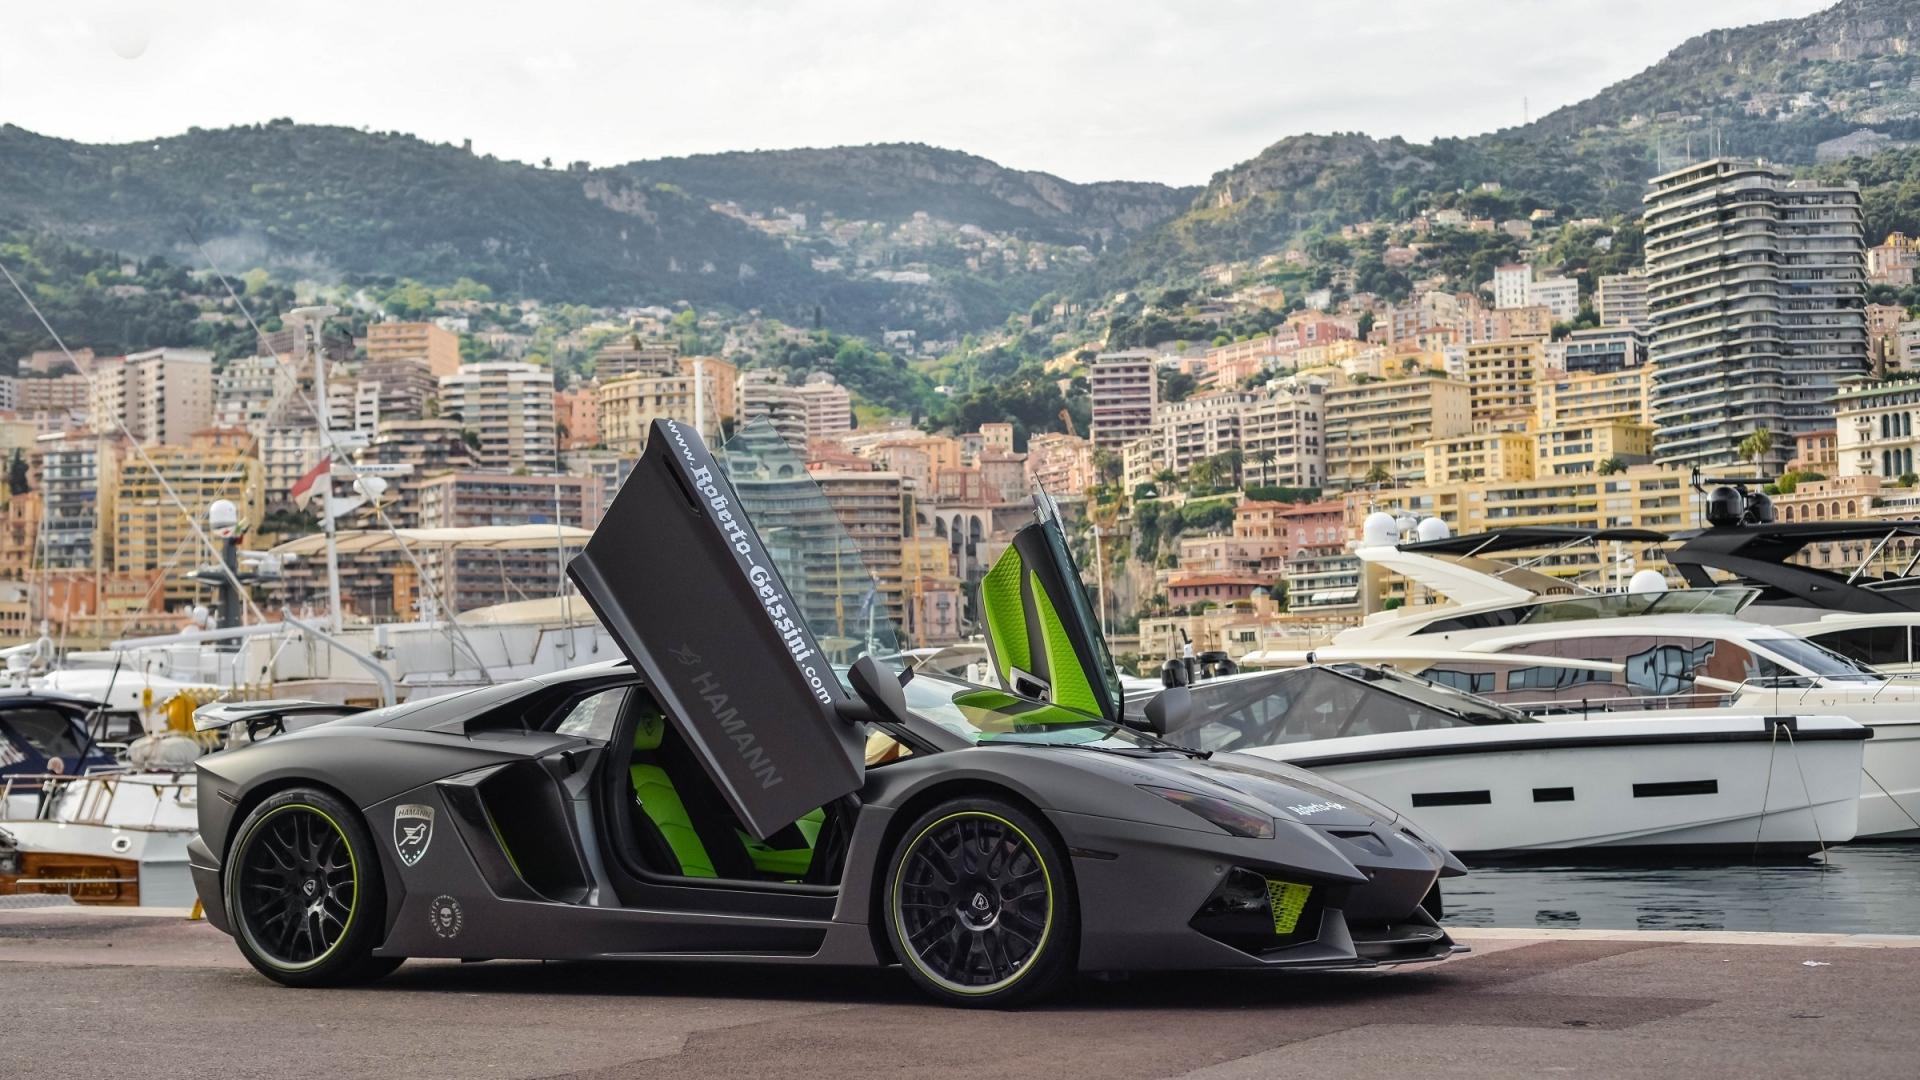 Lp700 4, Lamborghini, Aventador